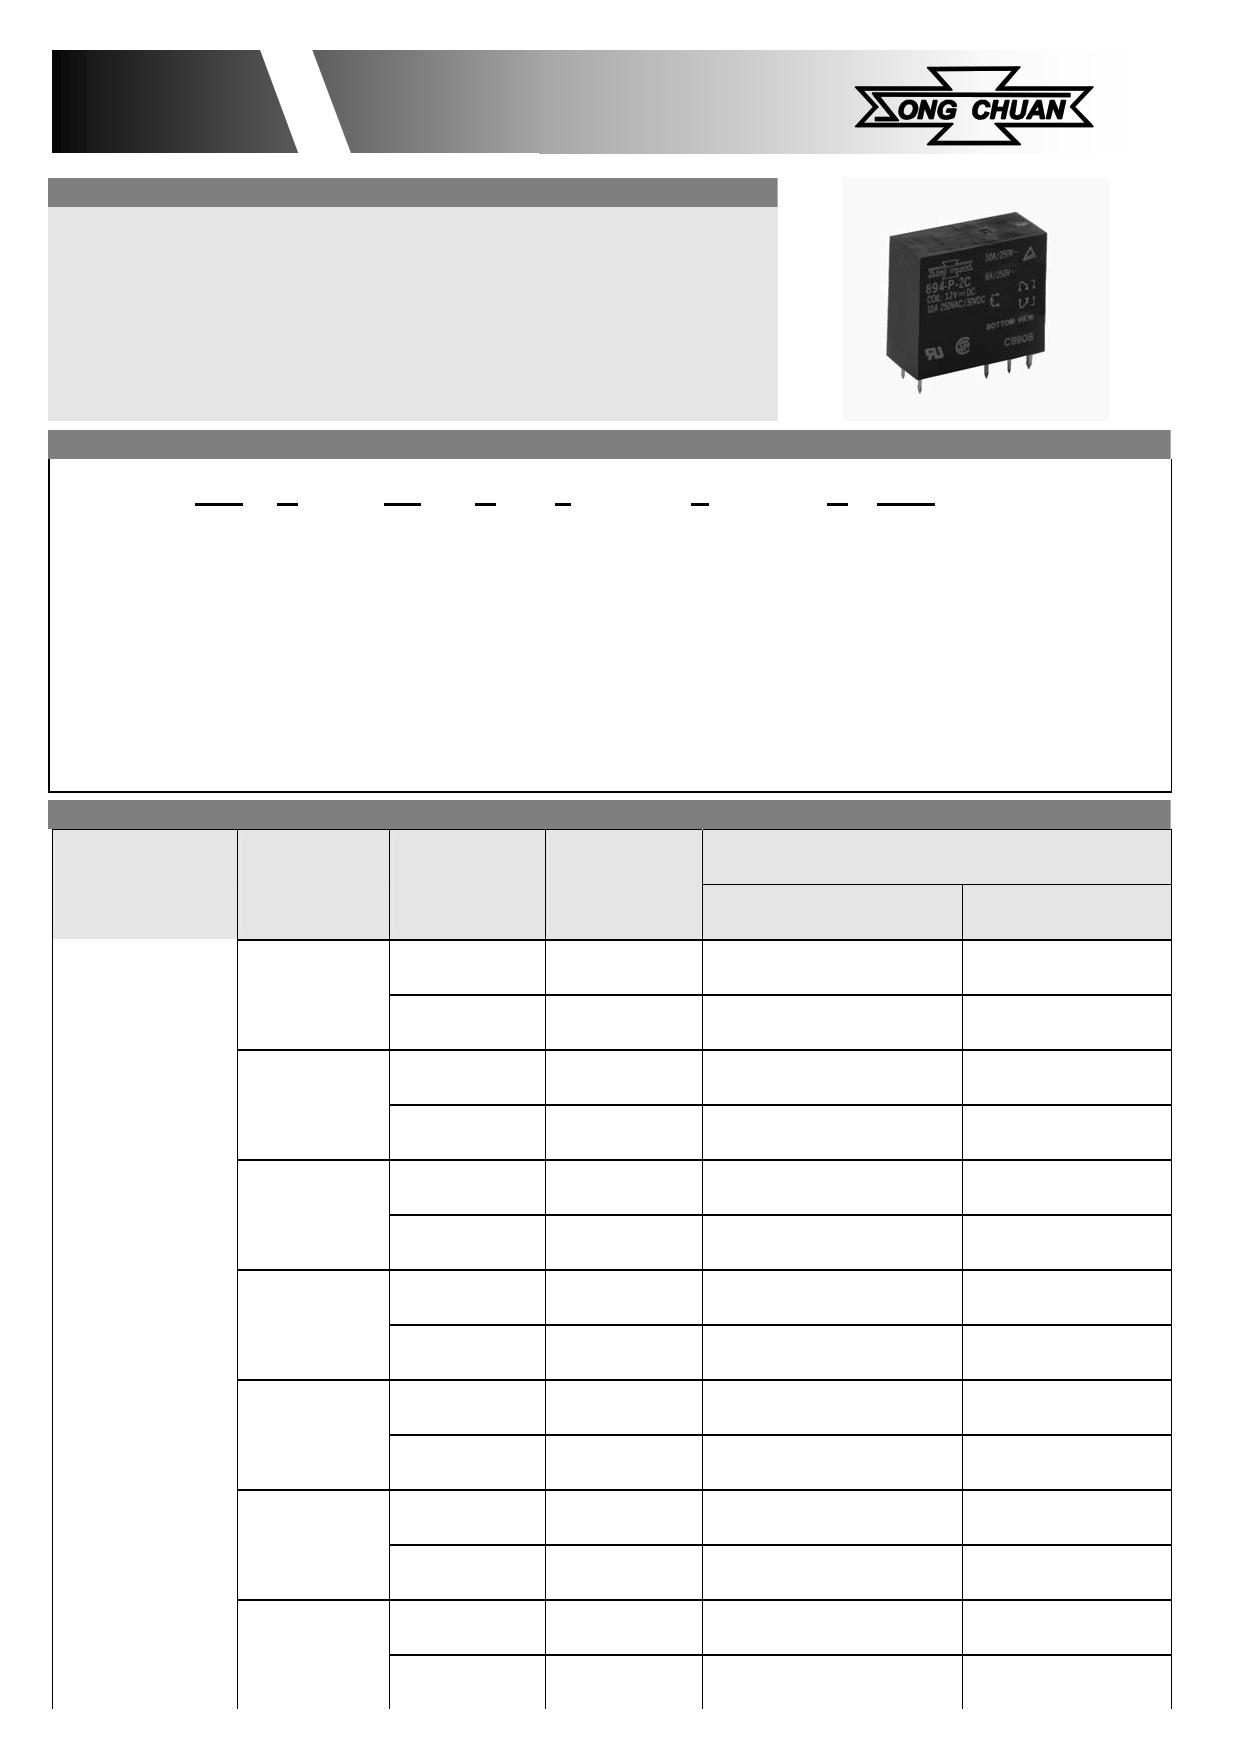 894-2AC2-F-S Datasheet, 894-2AC2-F-S PDF,ピン配置, 機能